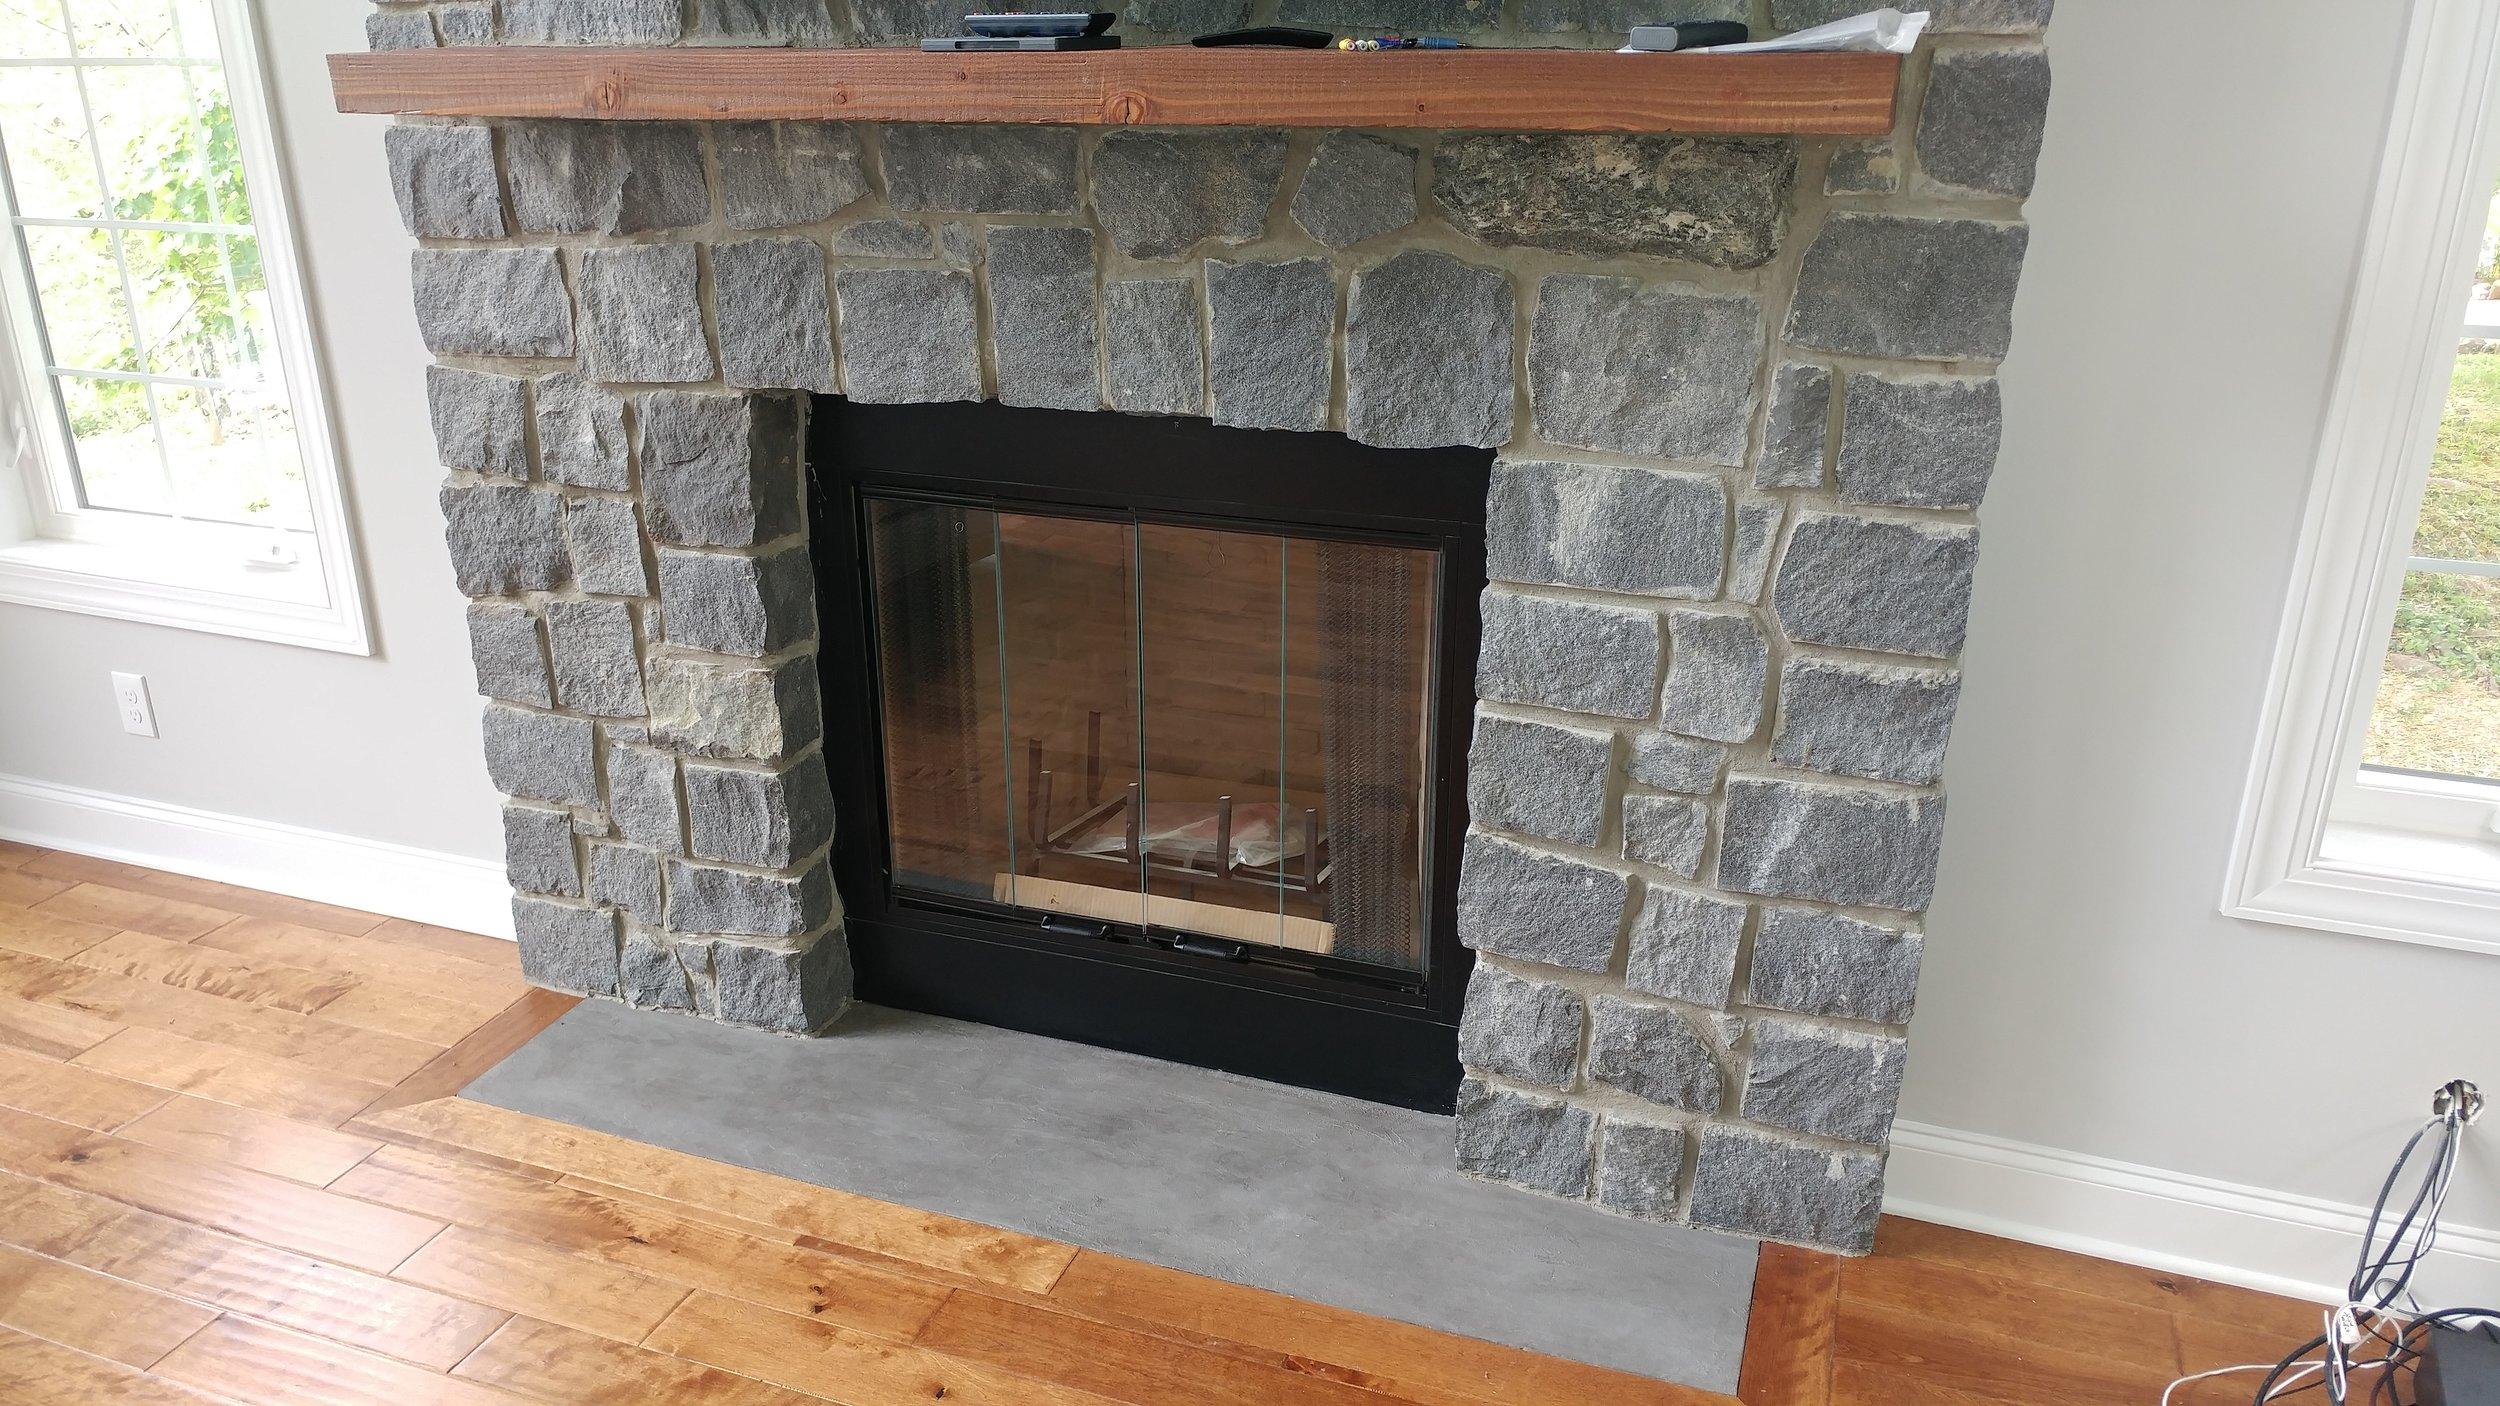 Texture Fireplace Hearth - Gladwyn, PA